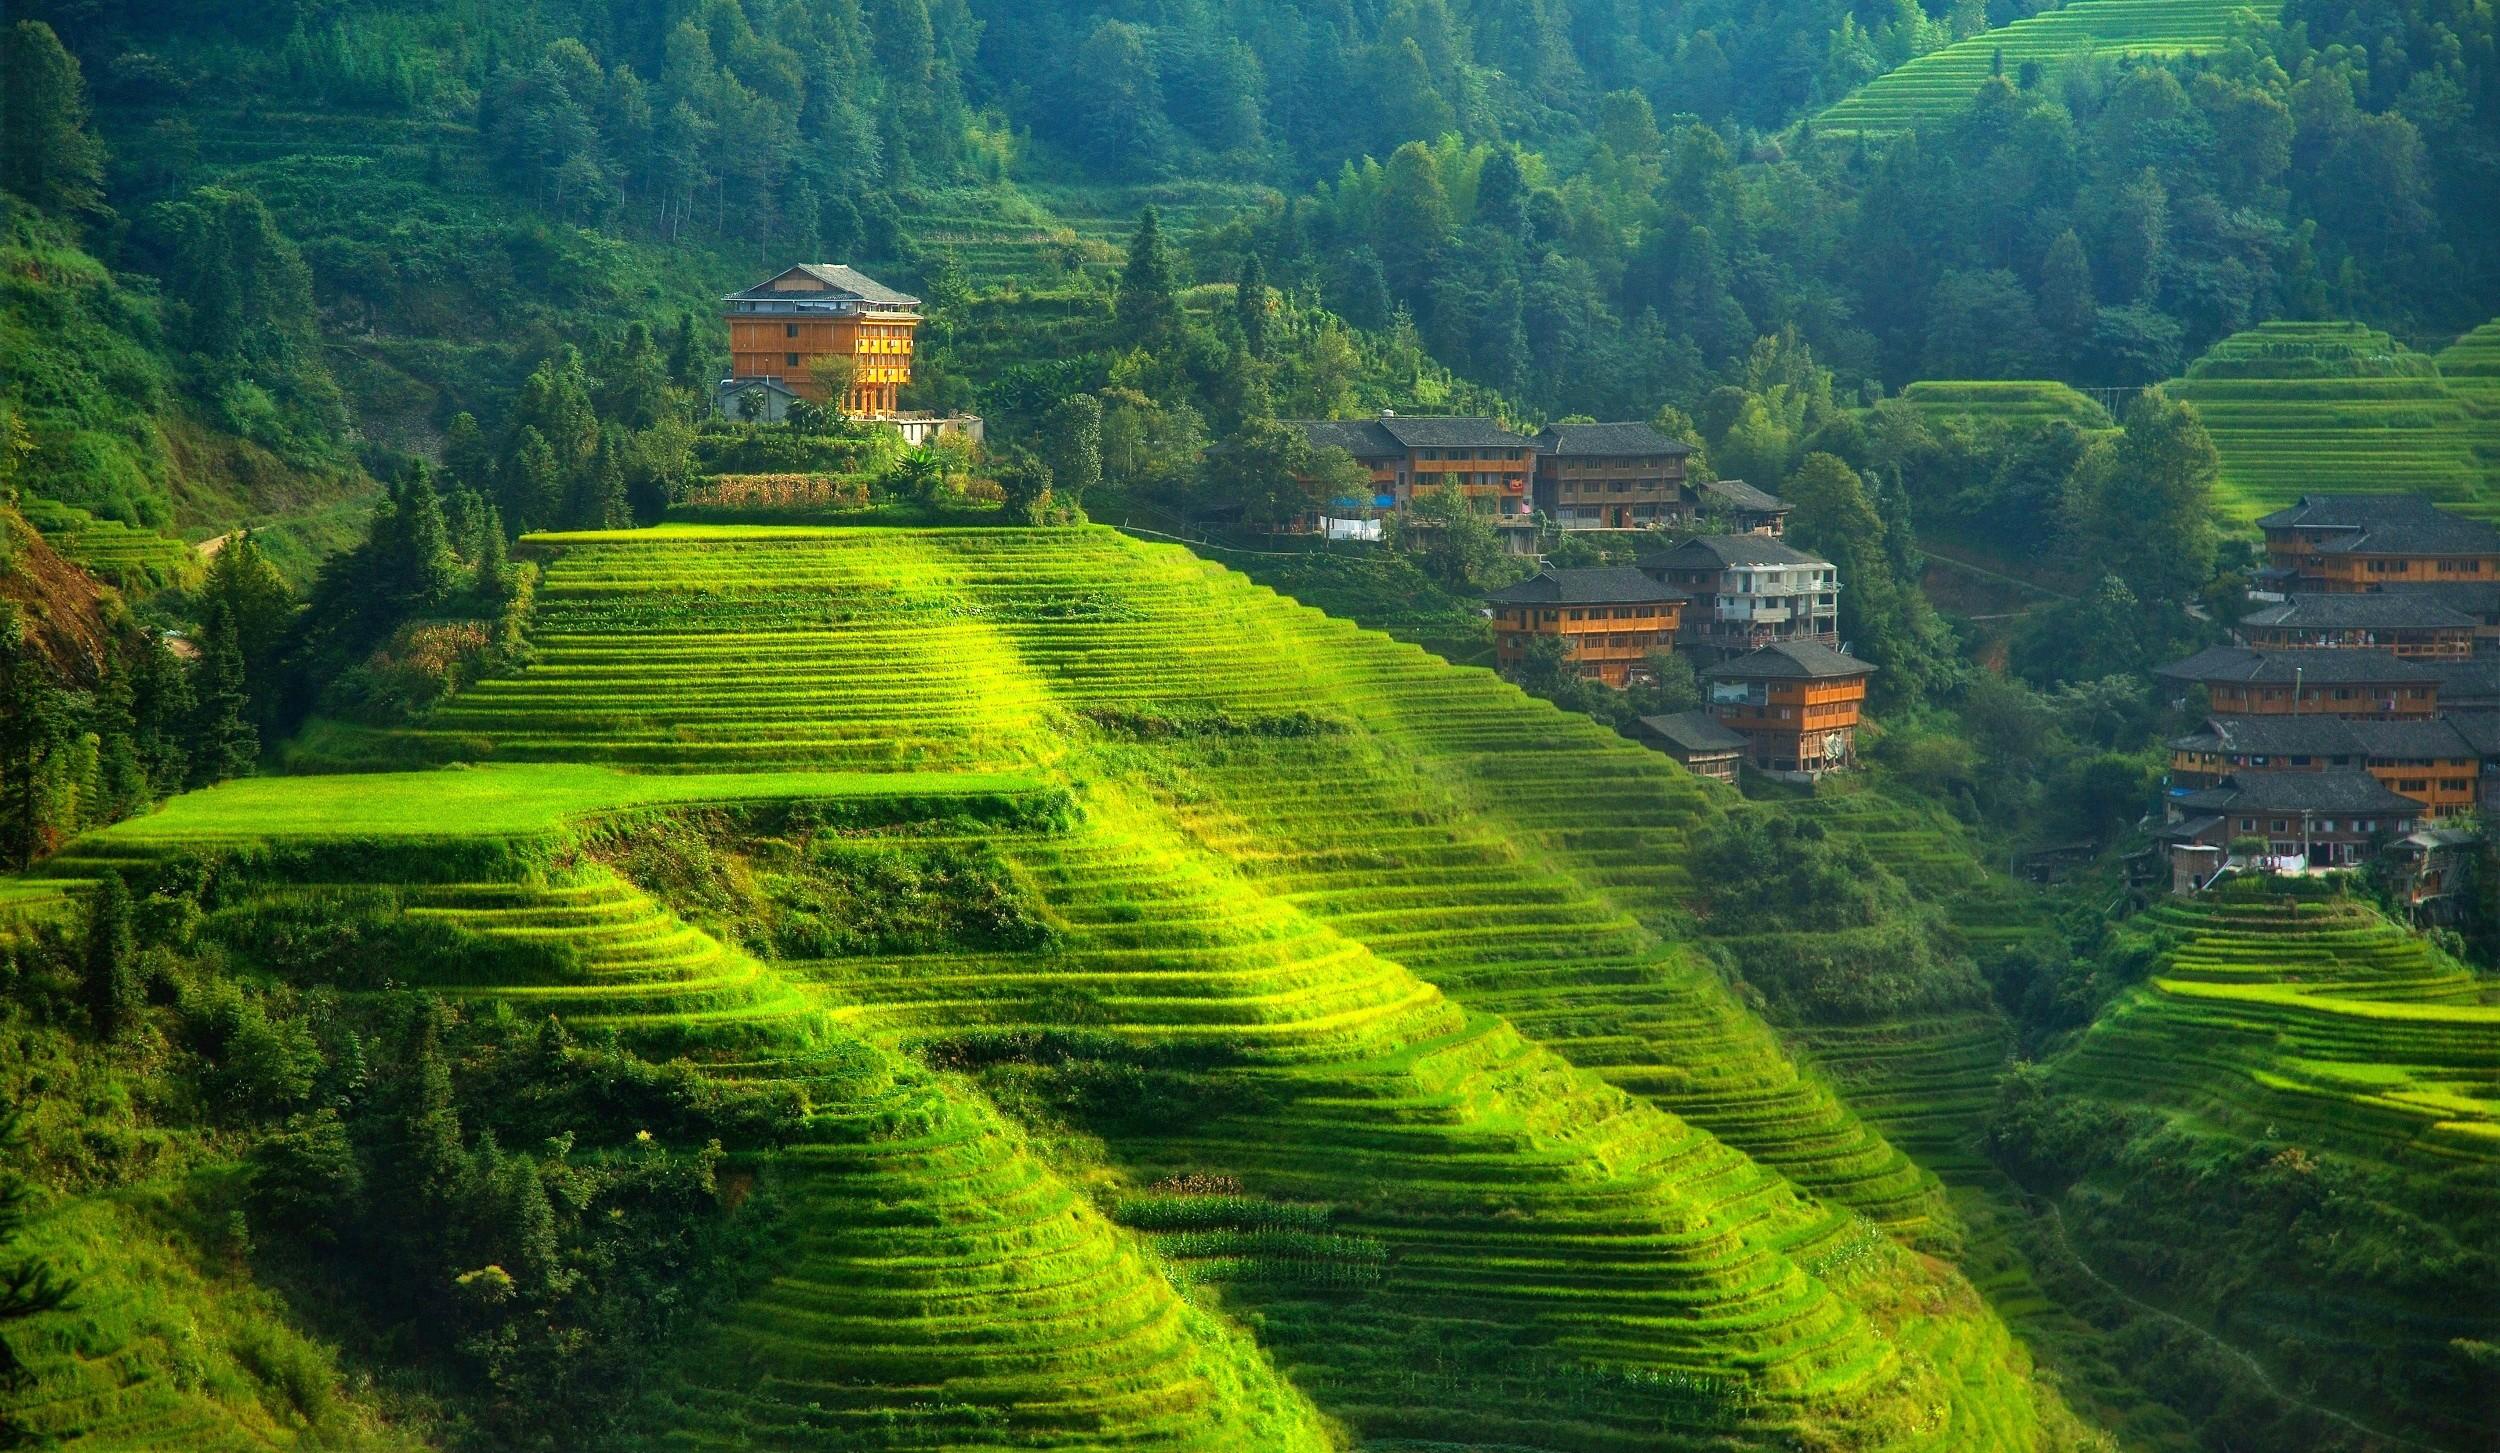 Fondos De Pantalla Paisaje China Colina Naturaleza